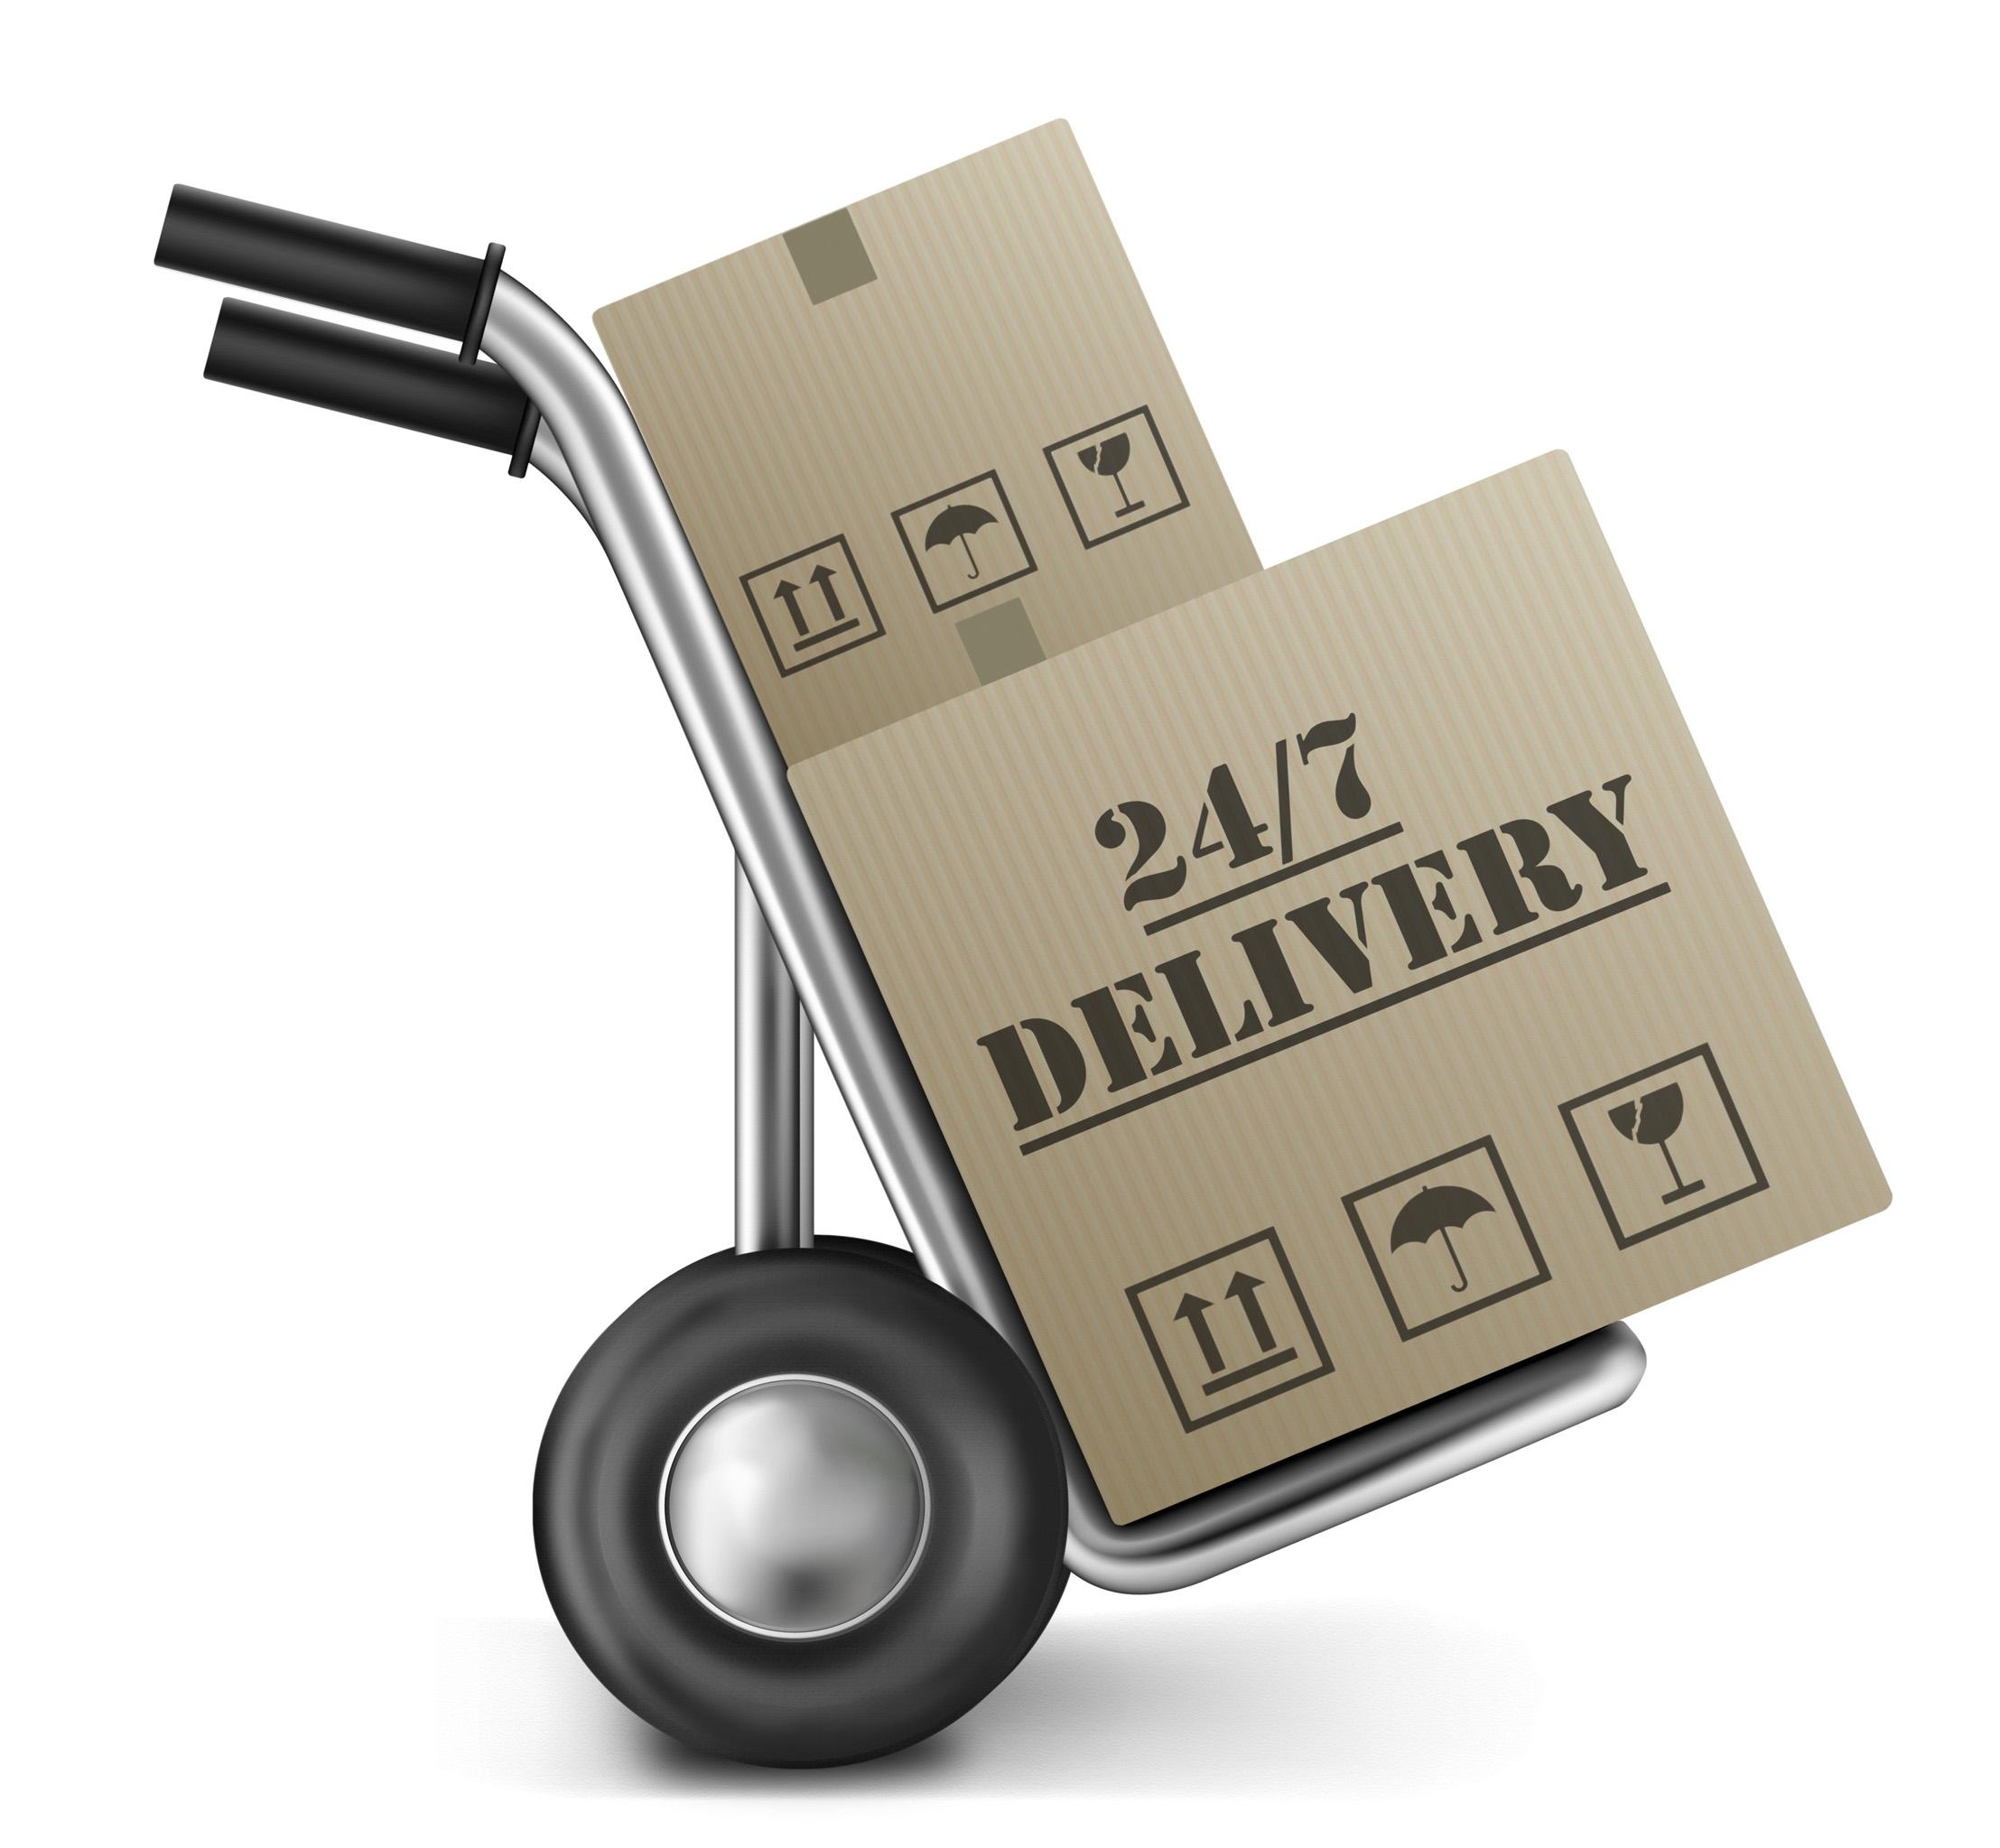 Boxshop Delivery Free Images At Clker Com Vector Clip Art Online